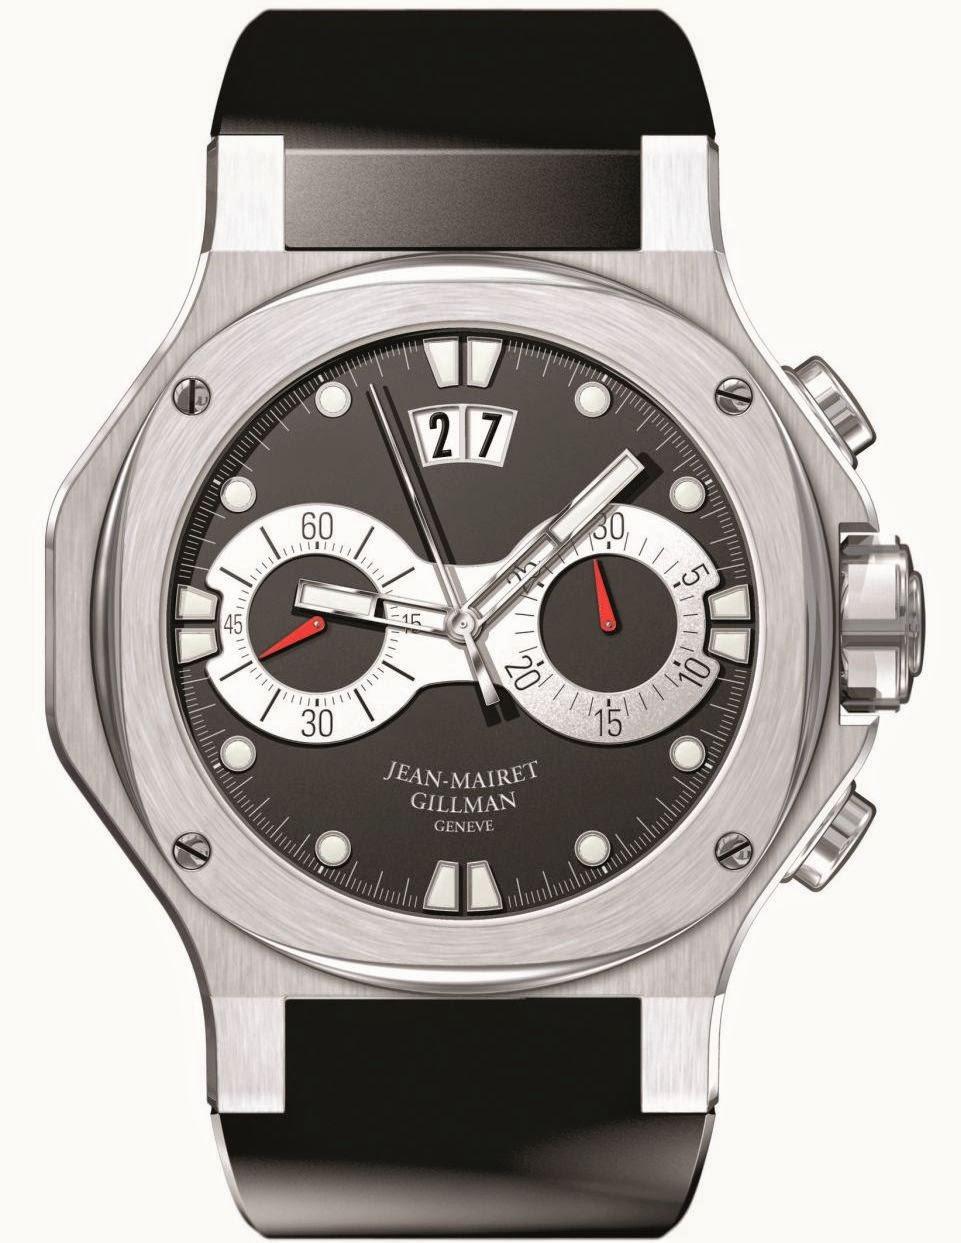 Jean-Mairet & Gillman Chronosport watch